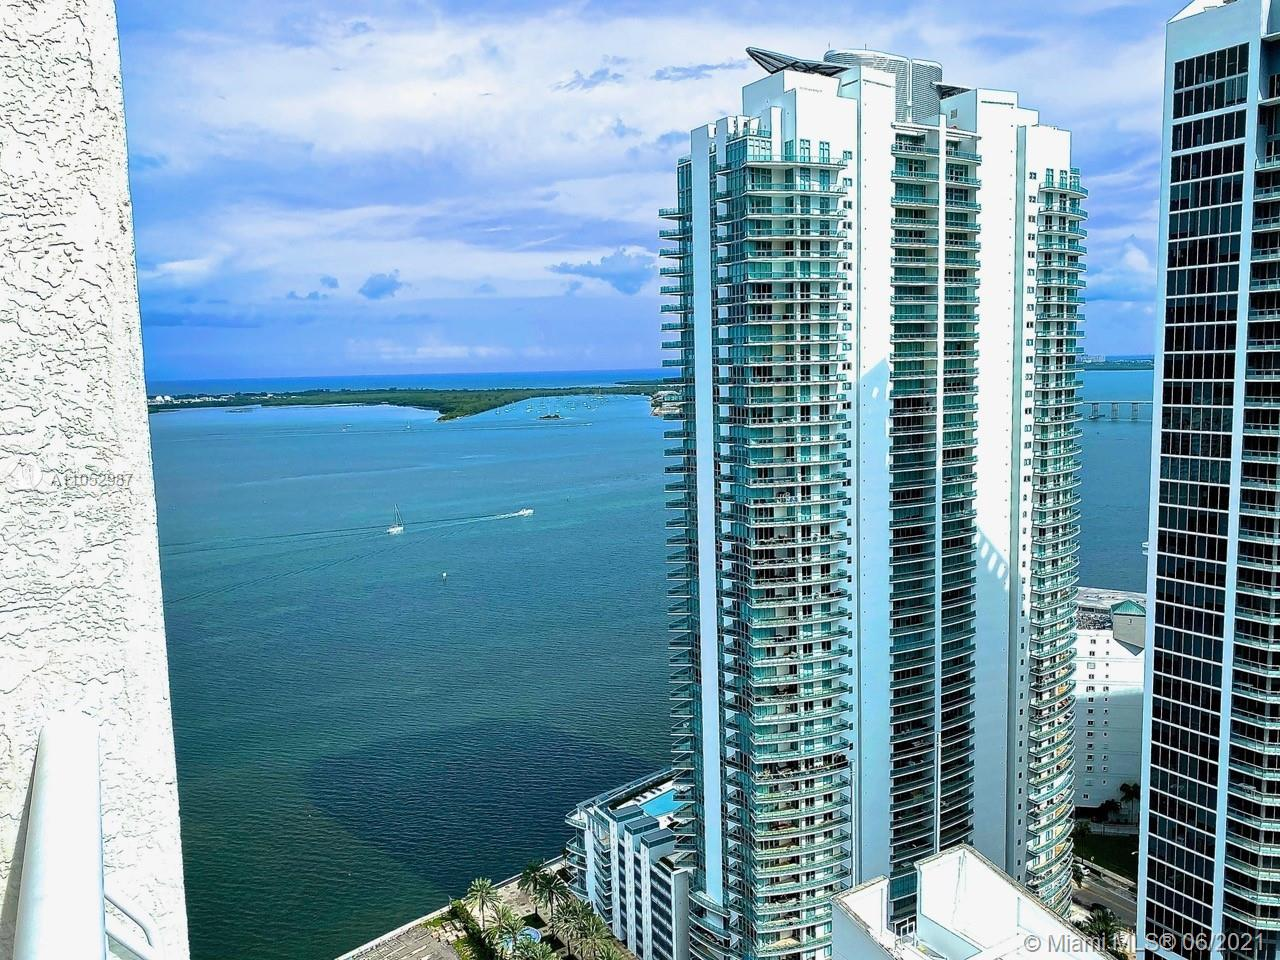 Club at Brickell #4215 - 1200 Brickell Bay Dr #4215, Miami, FL 33131